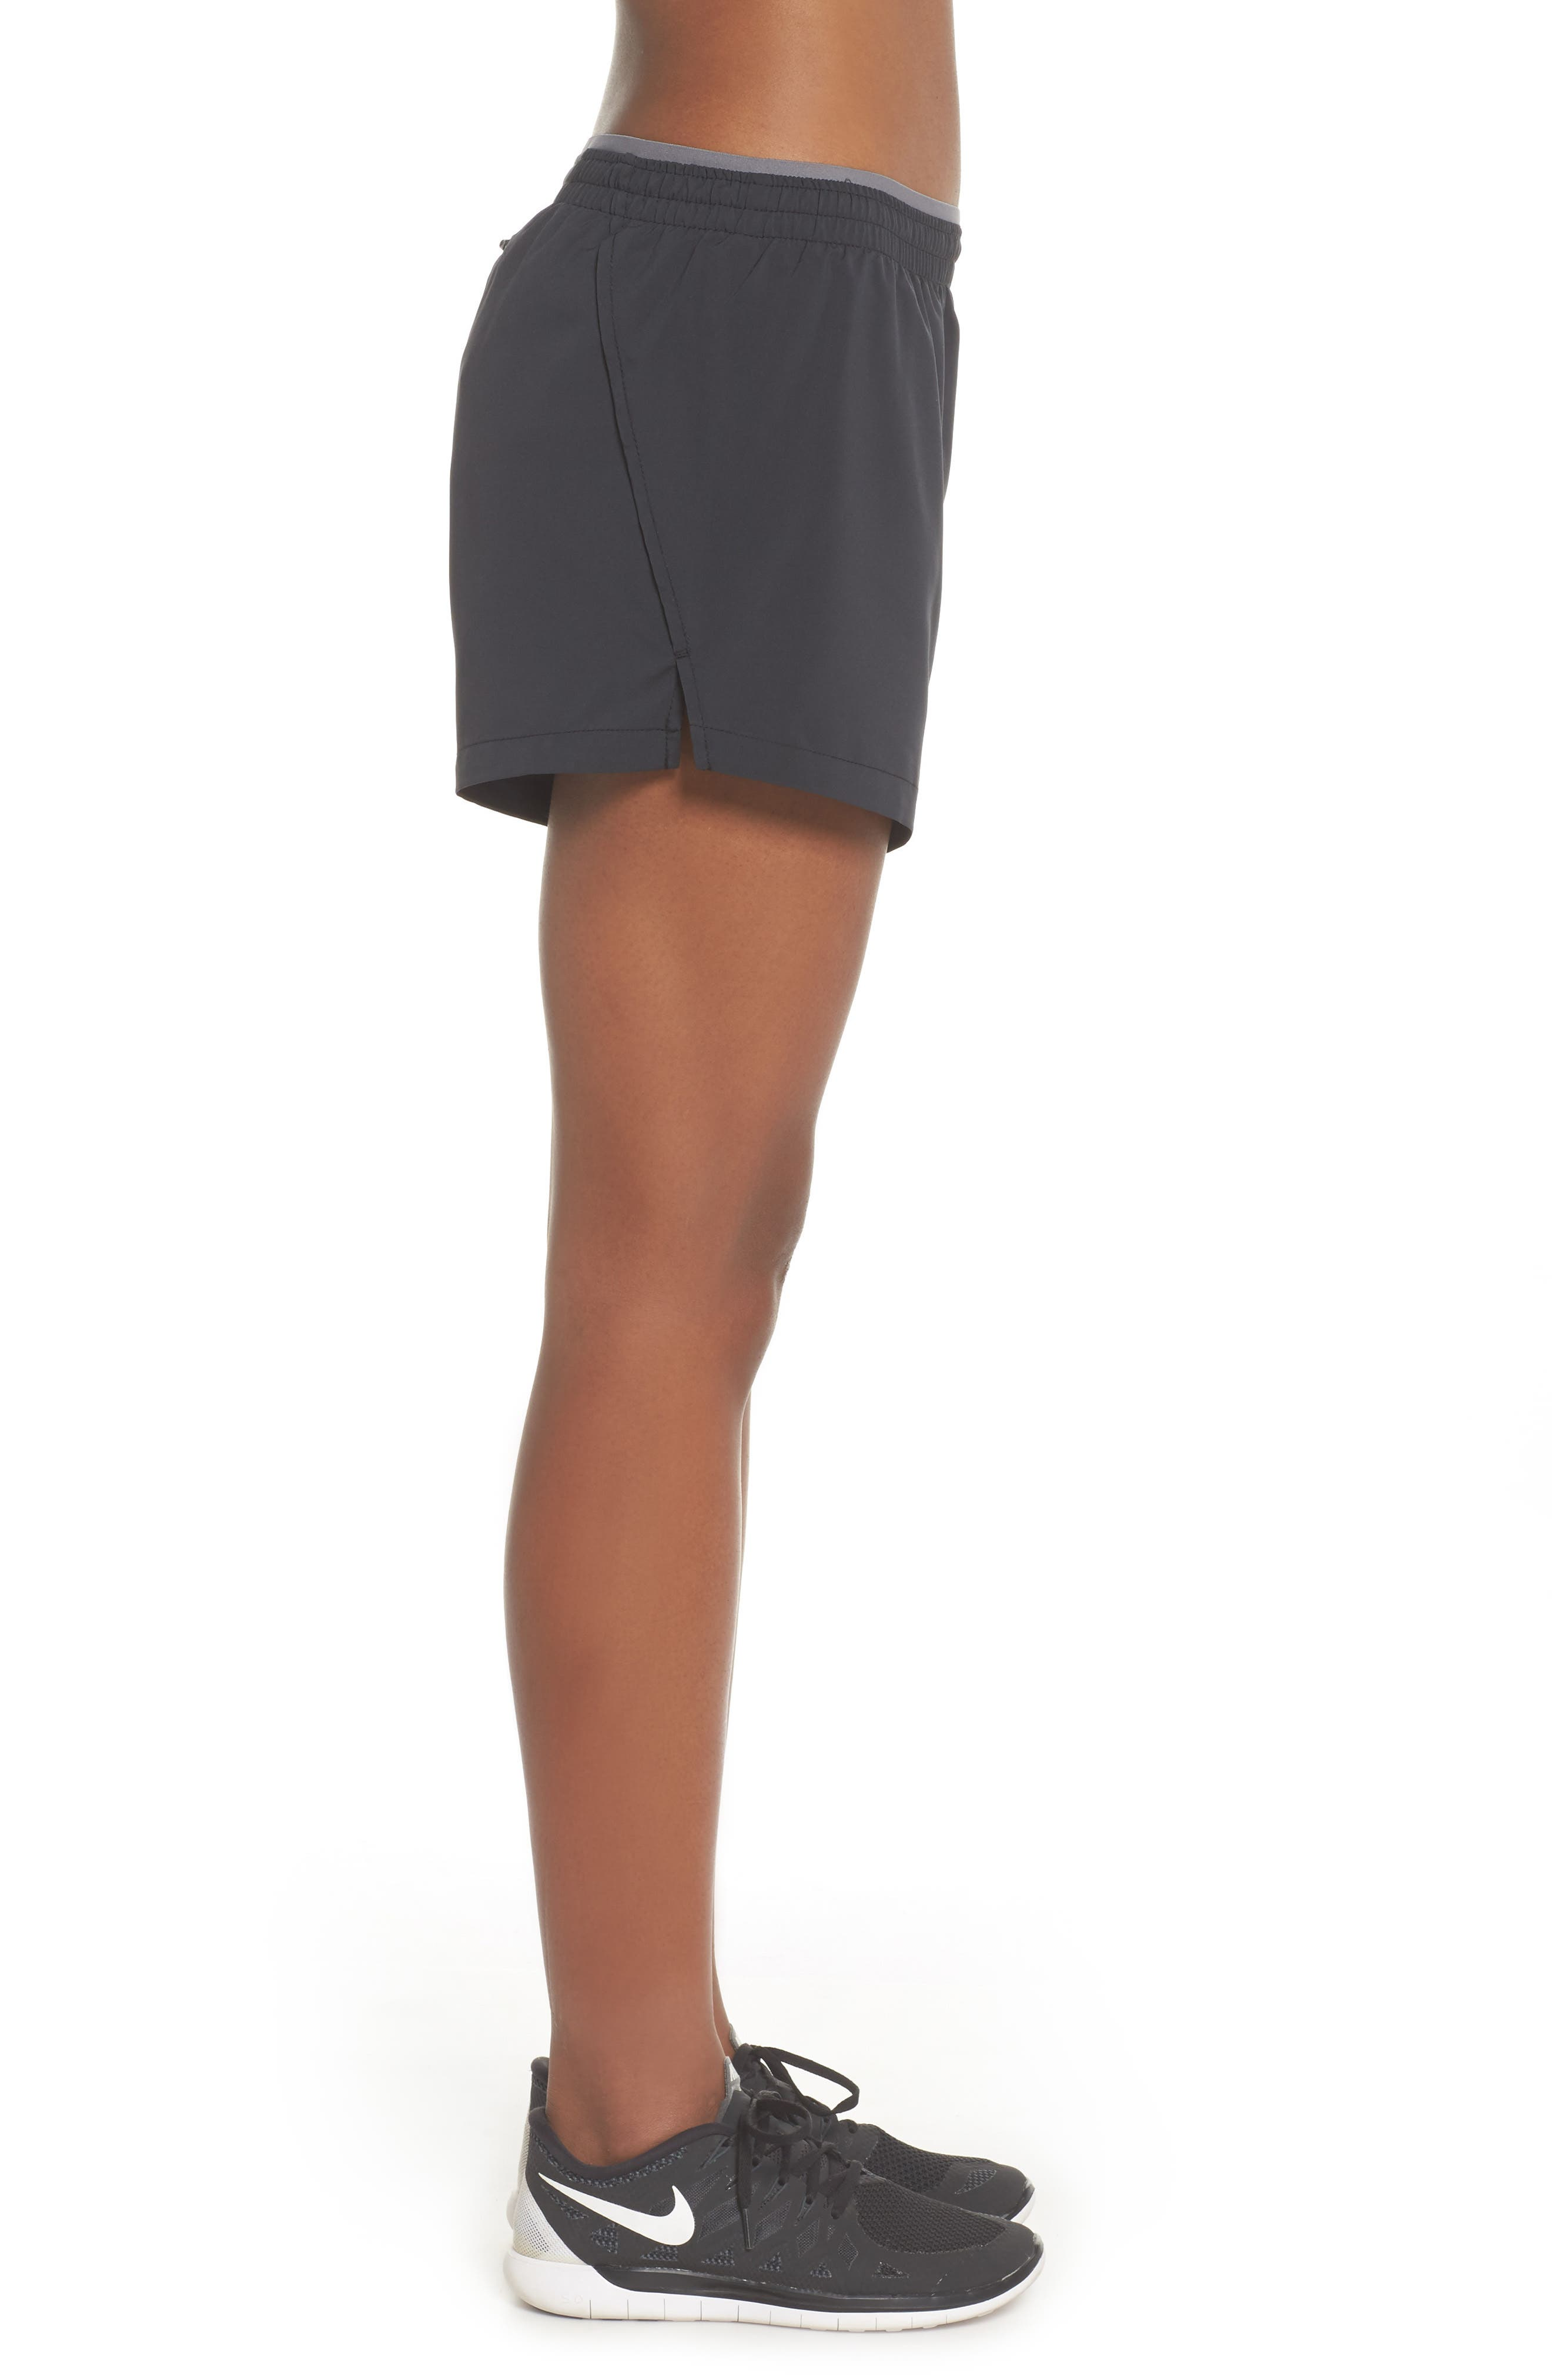 Flex 5-Inch Inseam Running Shorts,                             Alternate thumbnail 3, color,                             BLACK/ GUNSMOKE